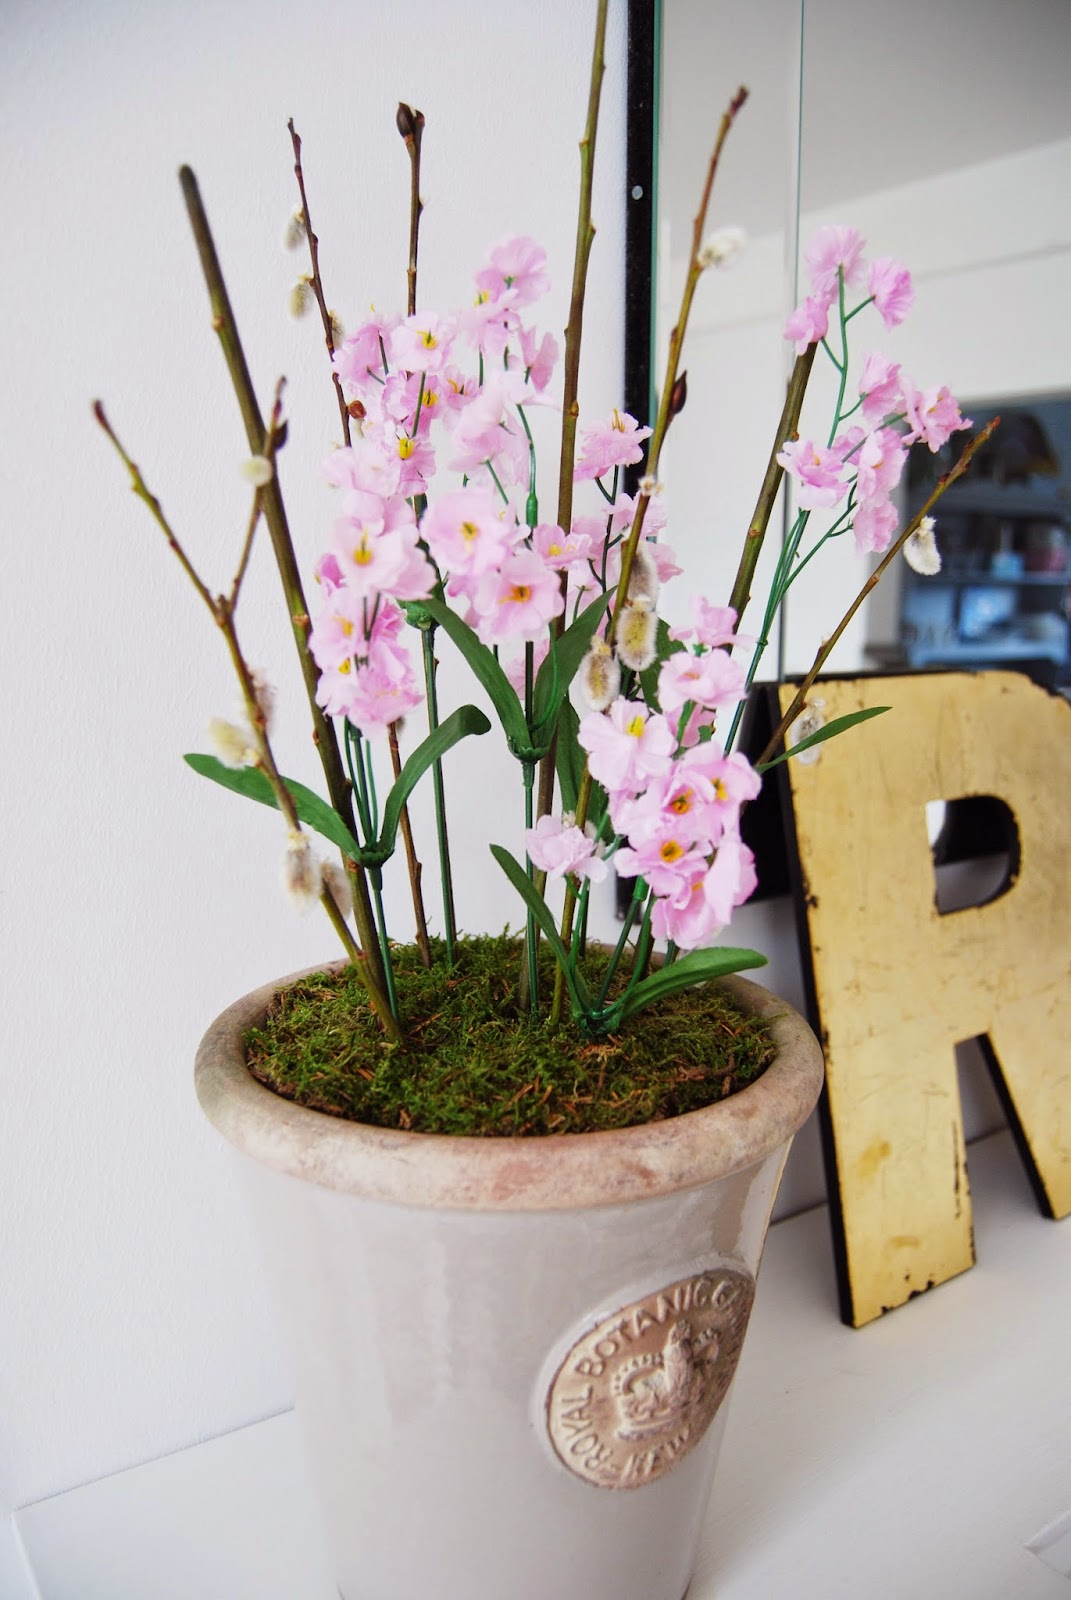 Brick Dust \u0026 Glitter & Artificial Flower Plant Pots | Brick Dust \u0026 Glitter